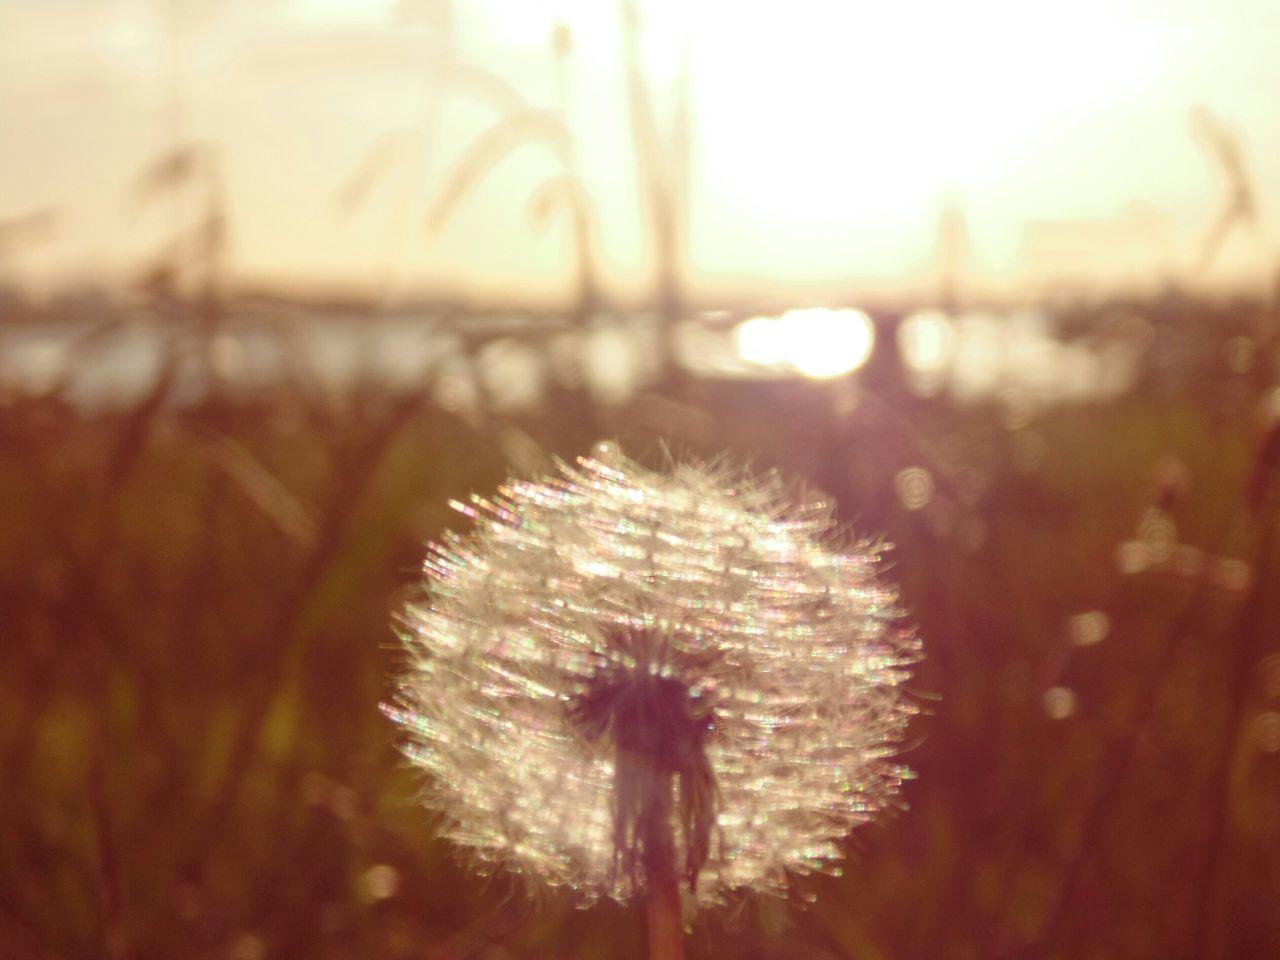 Glitch EyeEm Best Shots - No Edit Taking Photos Dandelion EyeEm Nature Lover Flower Moita The Great Outdoors - 2016 EyeEm Awards